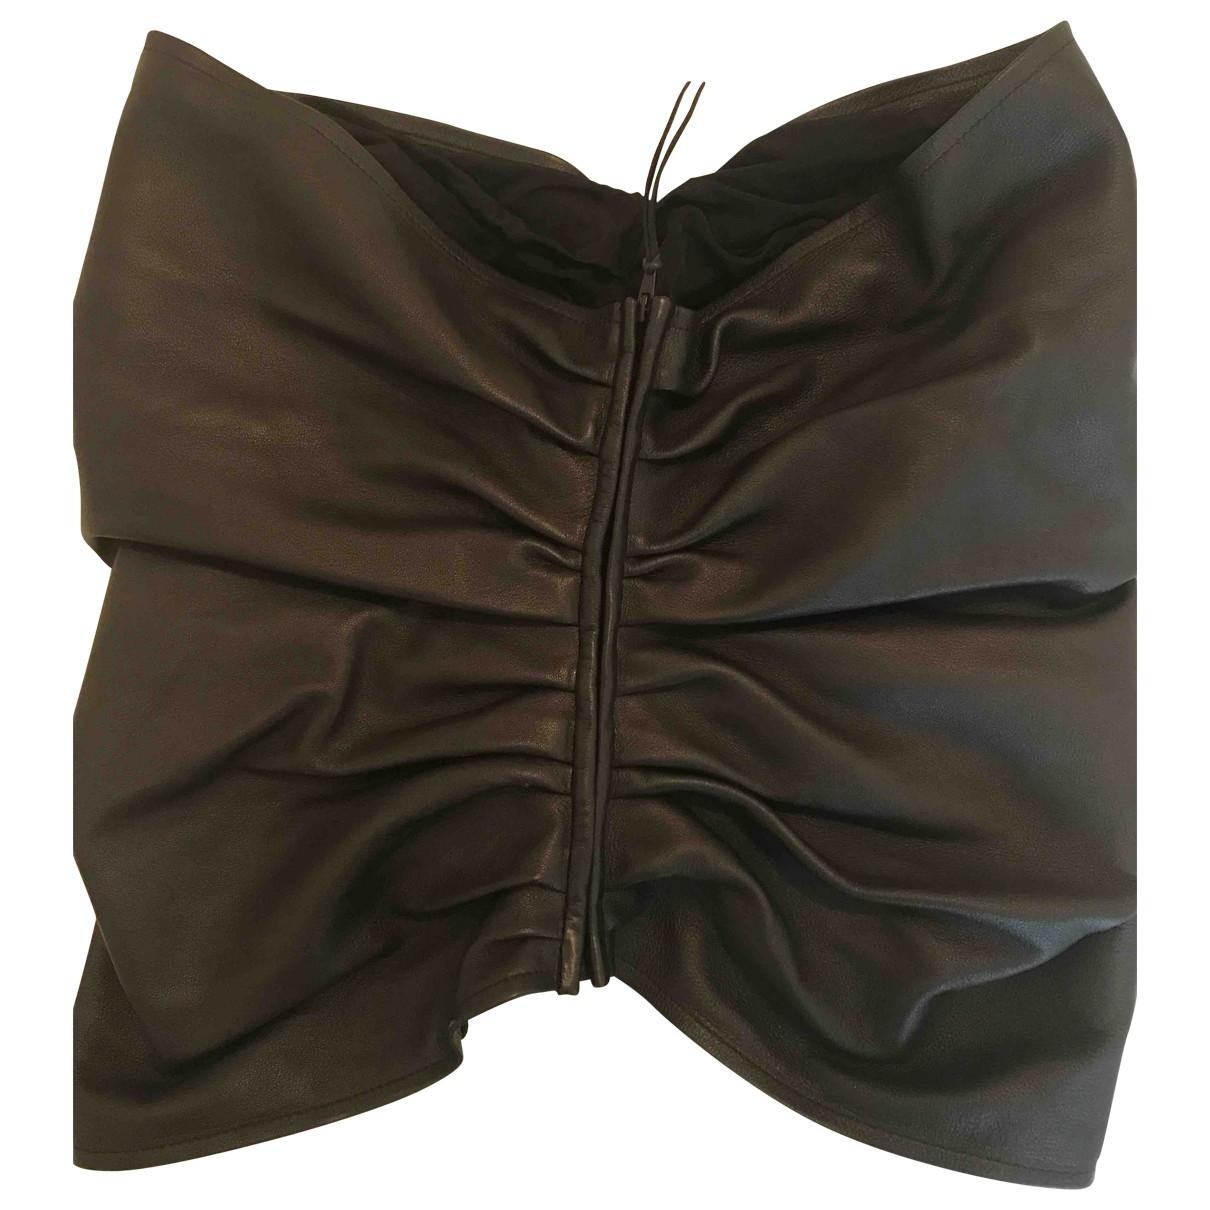 Maison Martin Margiela \N Brown Leather belt for Women L International